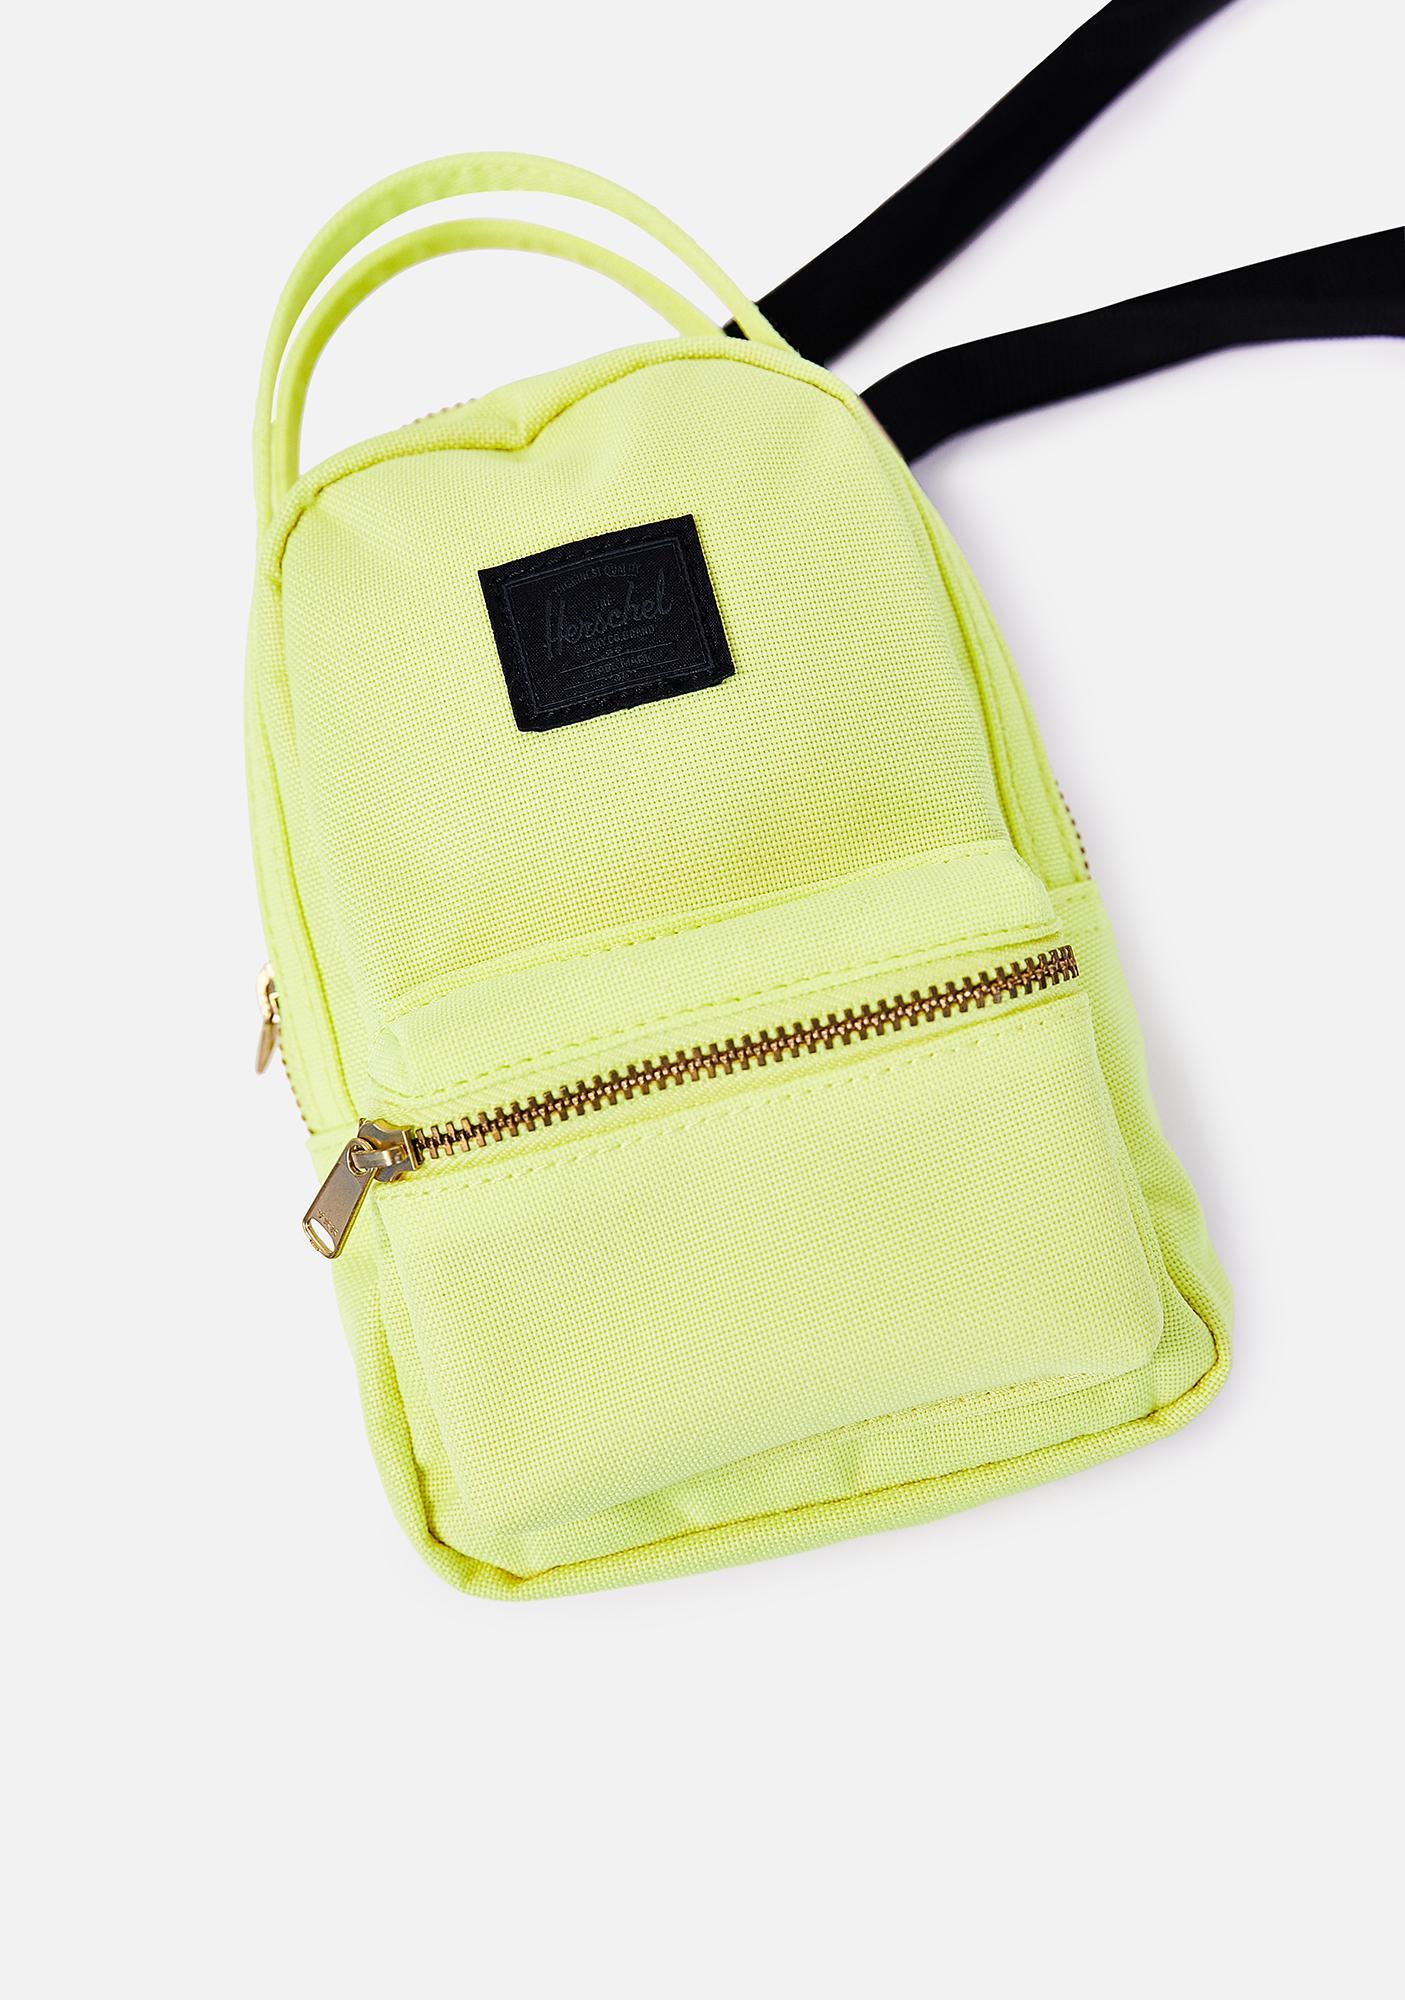 Herschel Highlight Nova Crossbody Bag